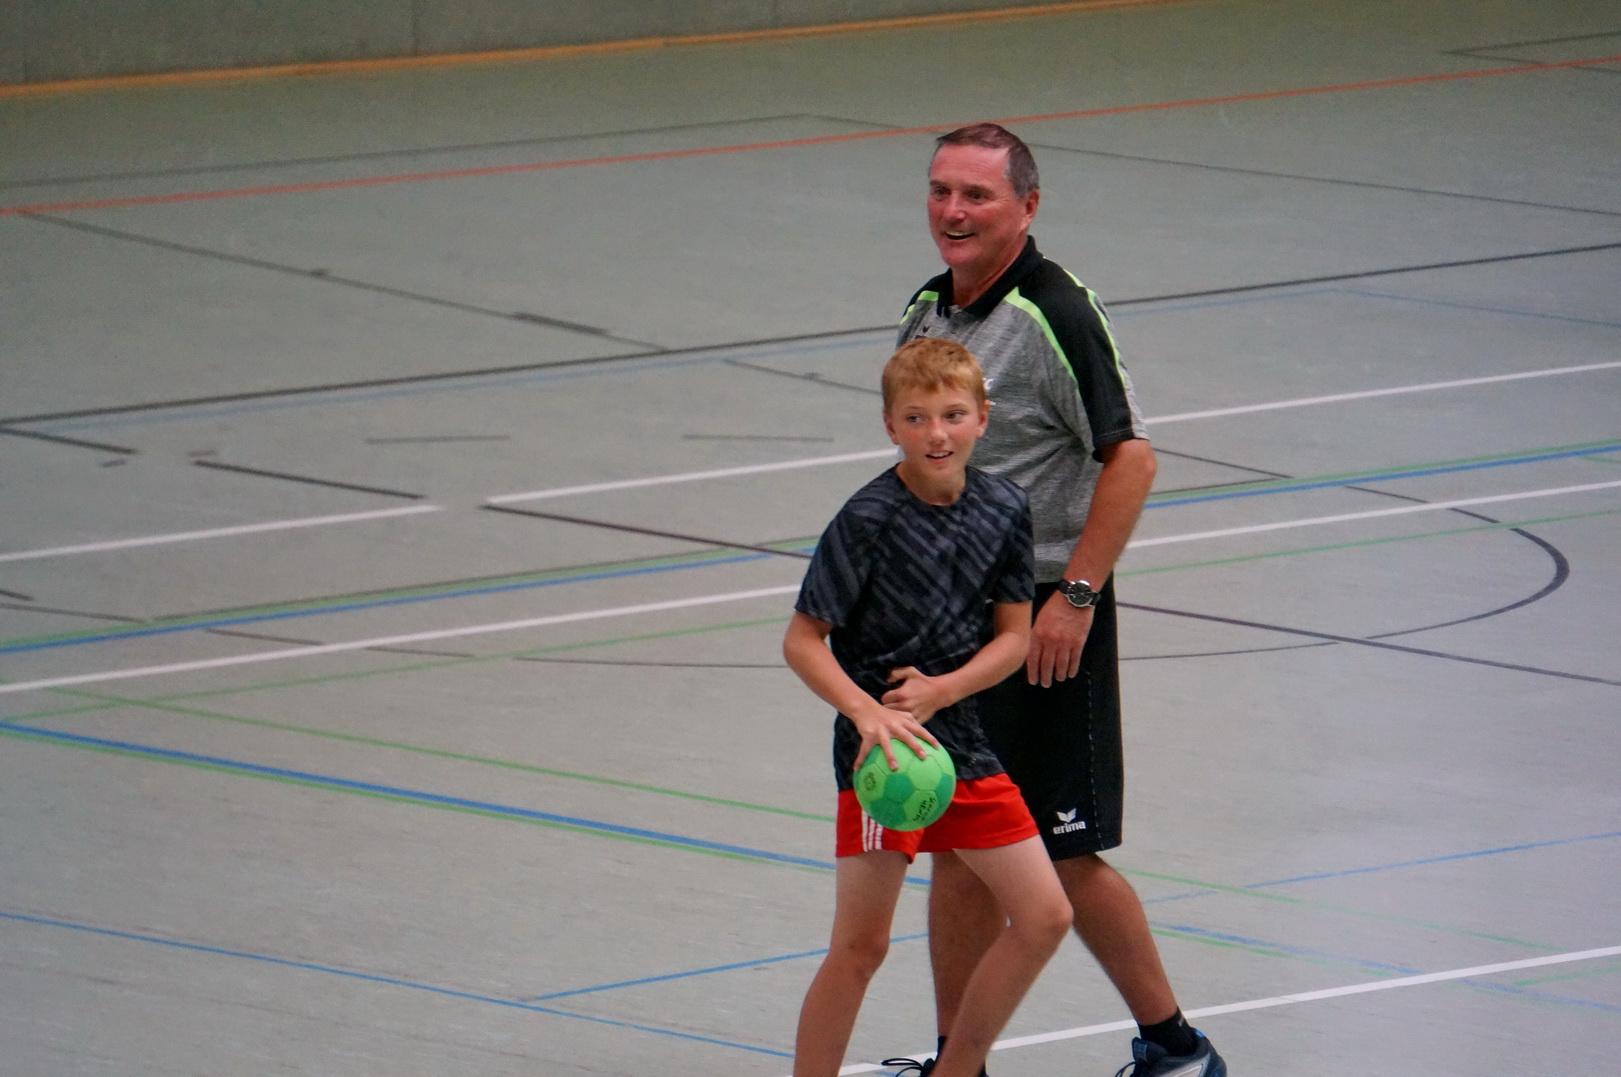 201808_Handballcamp_SDH_MG_096w